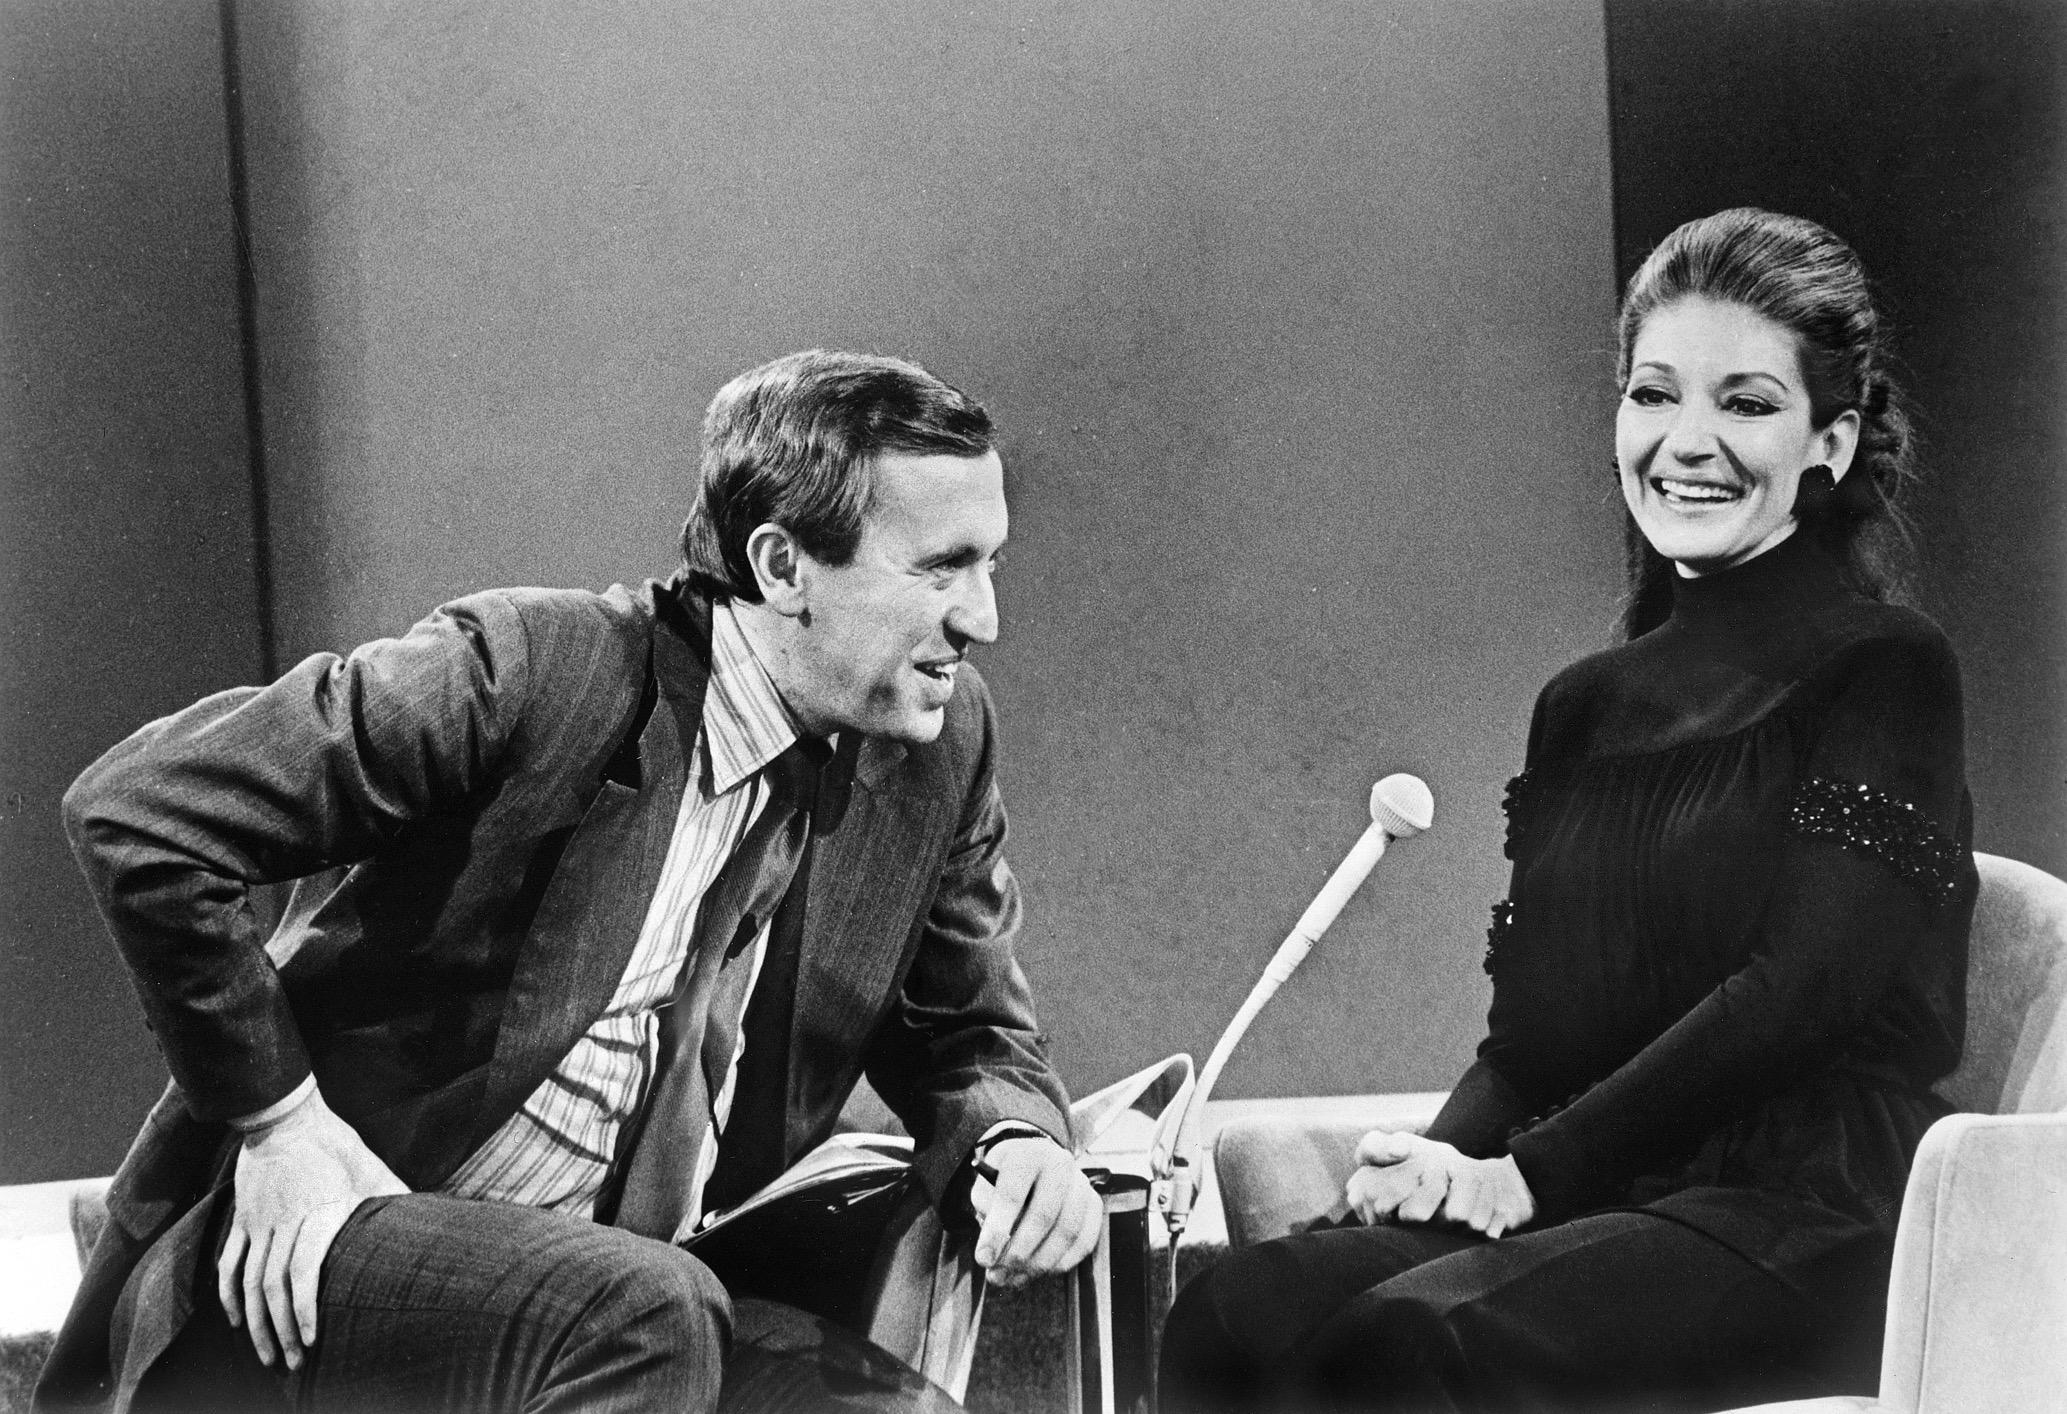 avec David Frost 1970 Copyright Fonds de Dotation Maria Callas.jpg